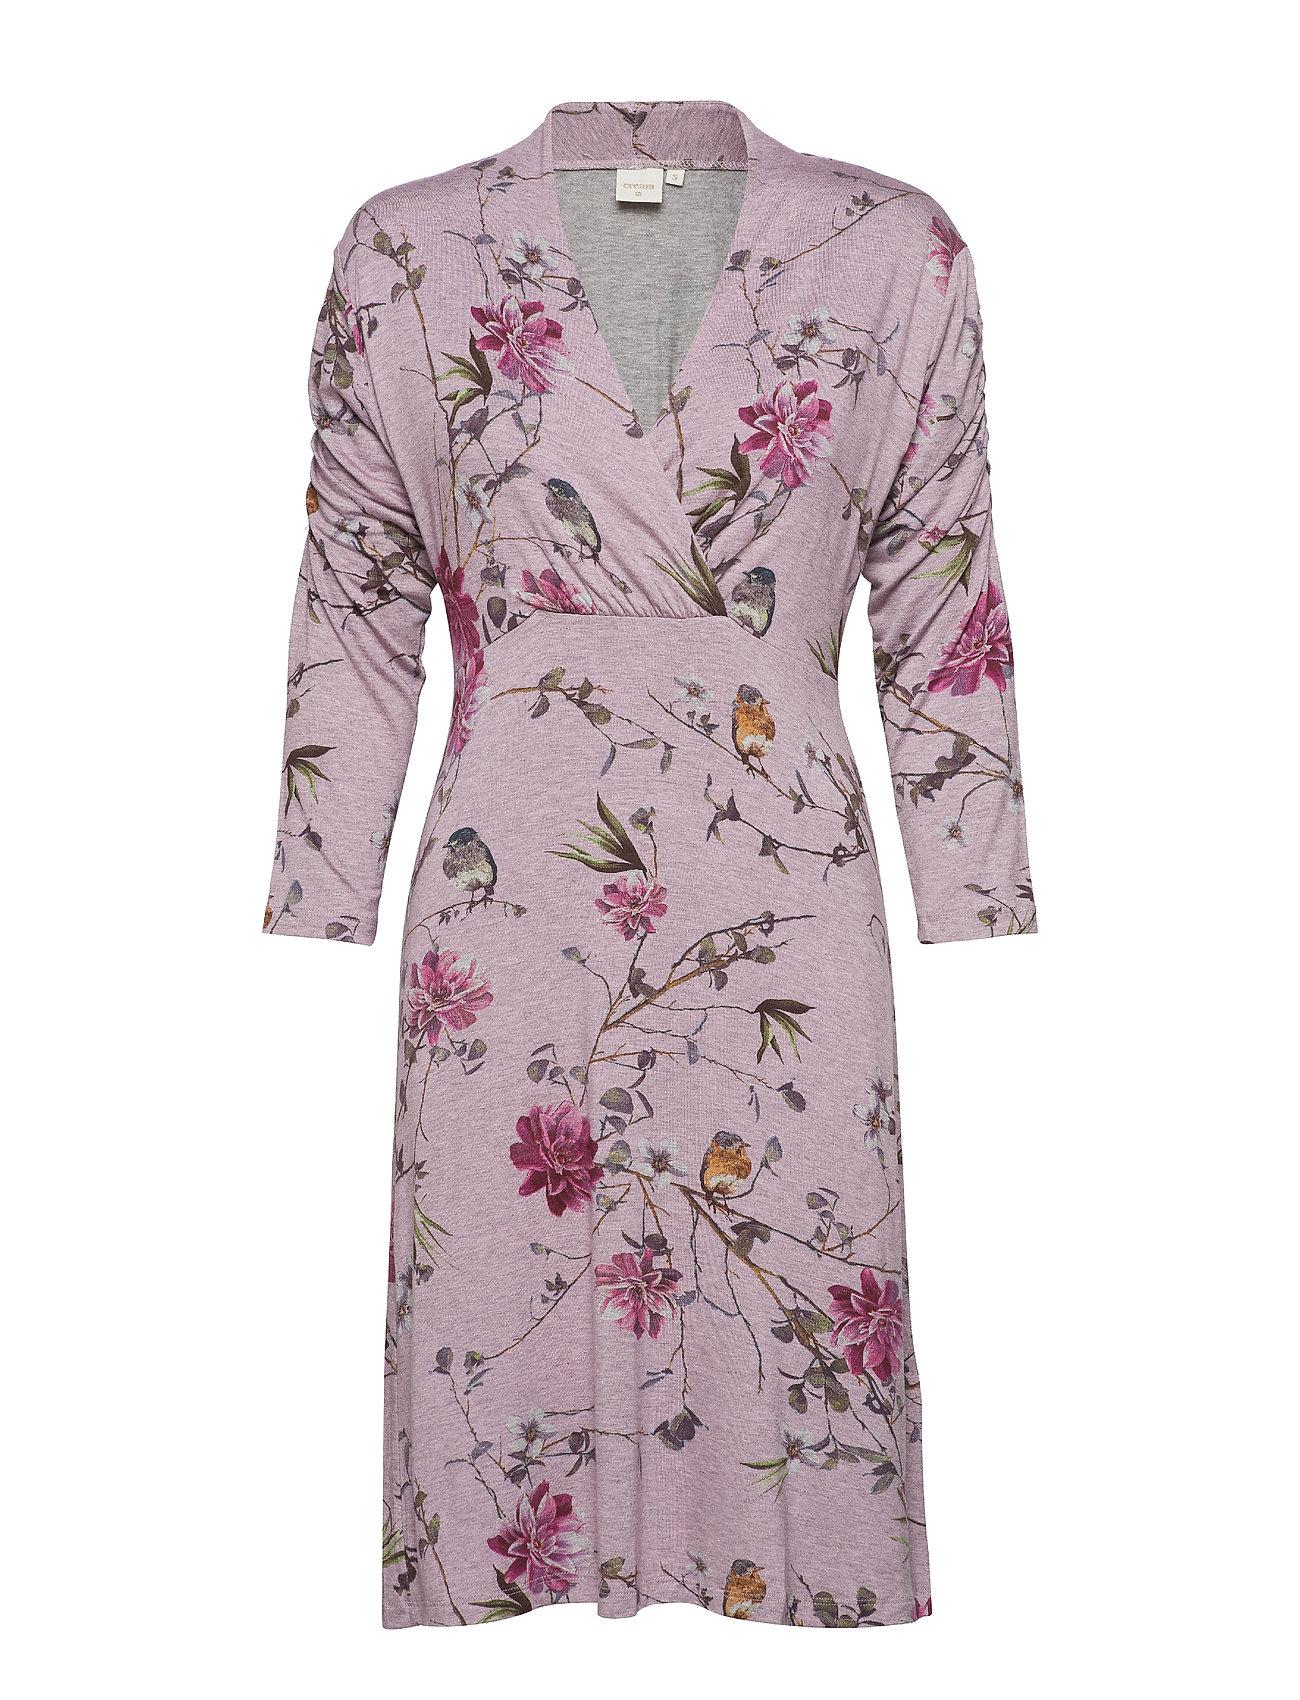 Image of Zagil Dress (3105941587)